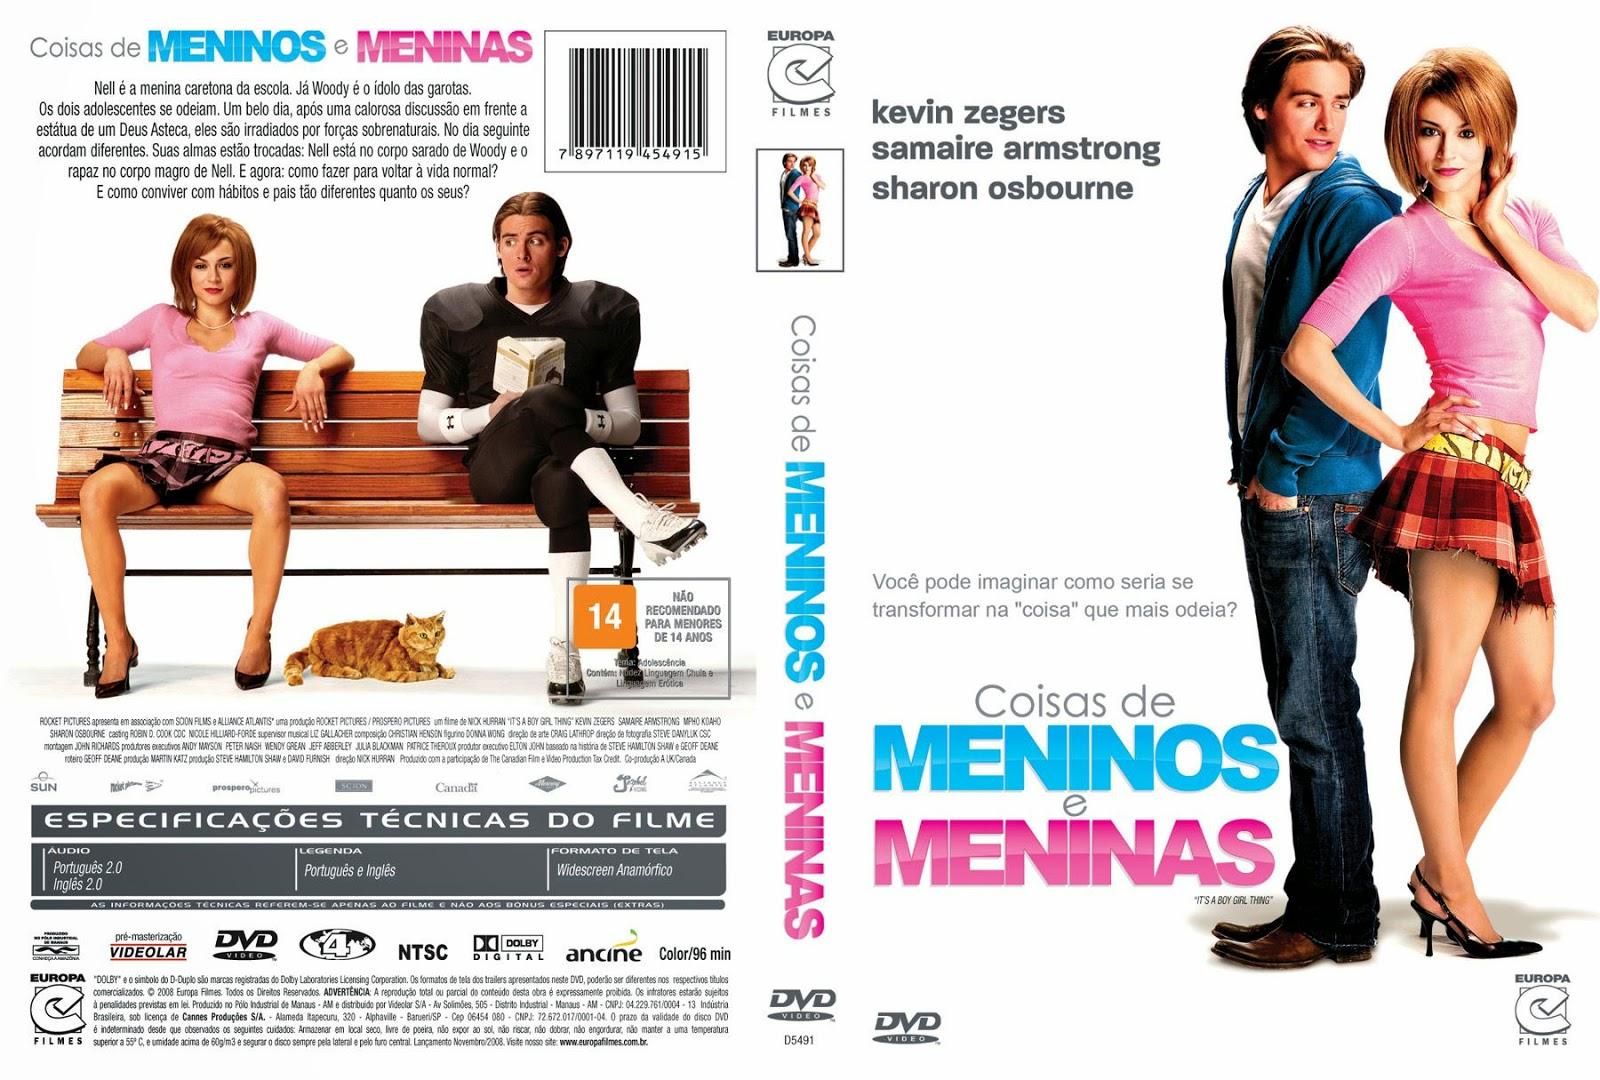 Capa DVD Coisas De Meninos E Meninas